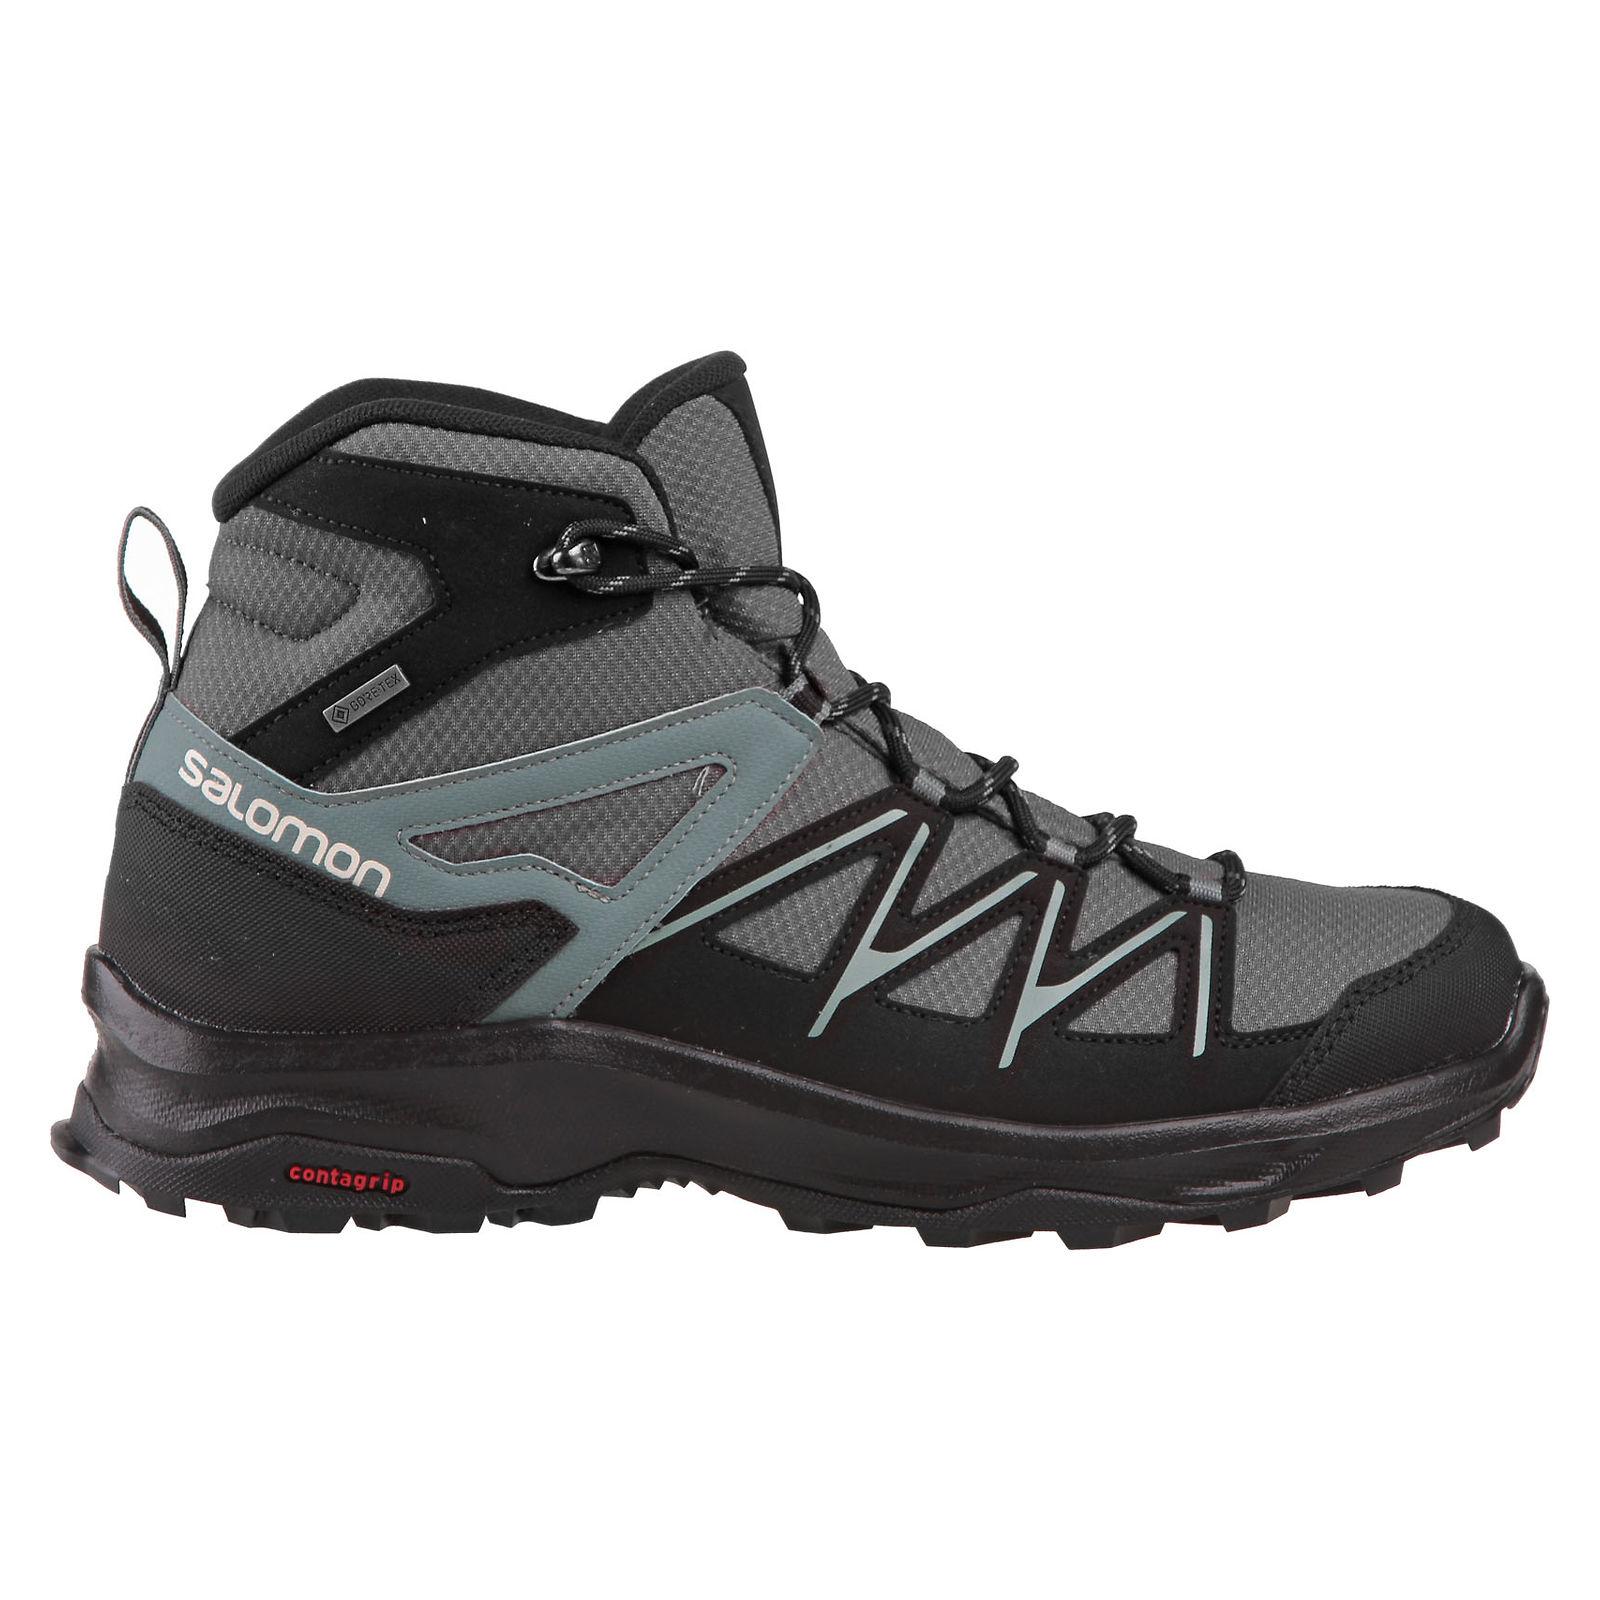 Buty trekkingowe męskie Salomon Daintree Mid GTX 412312